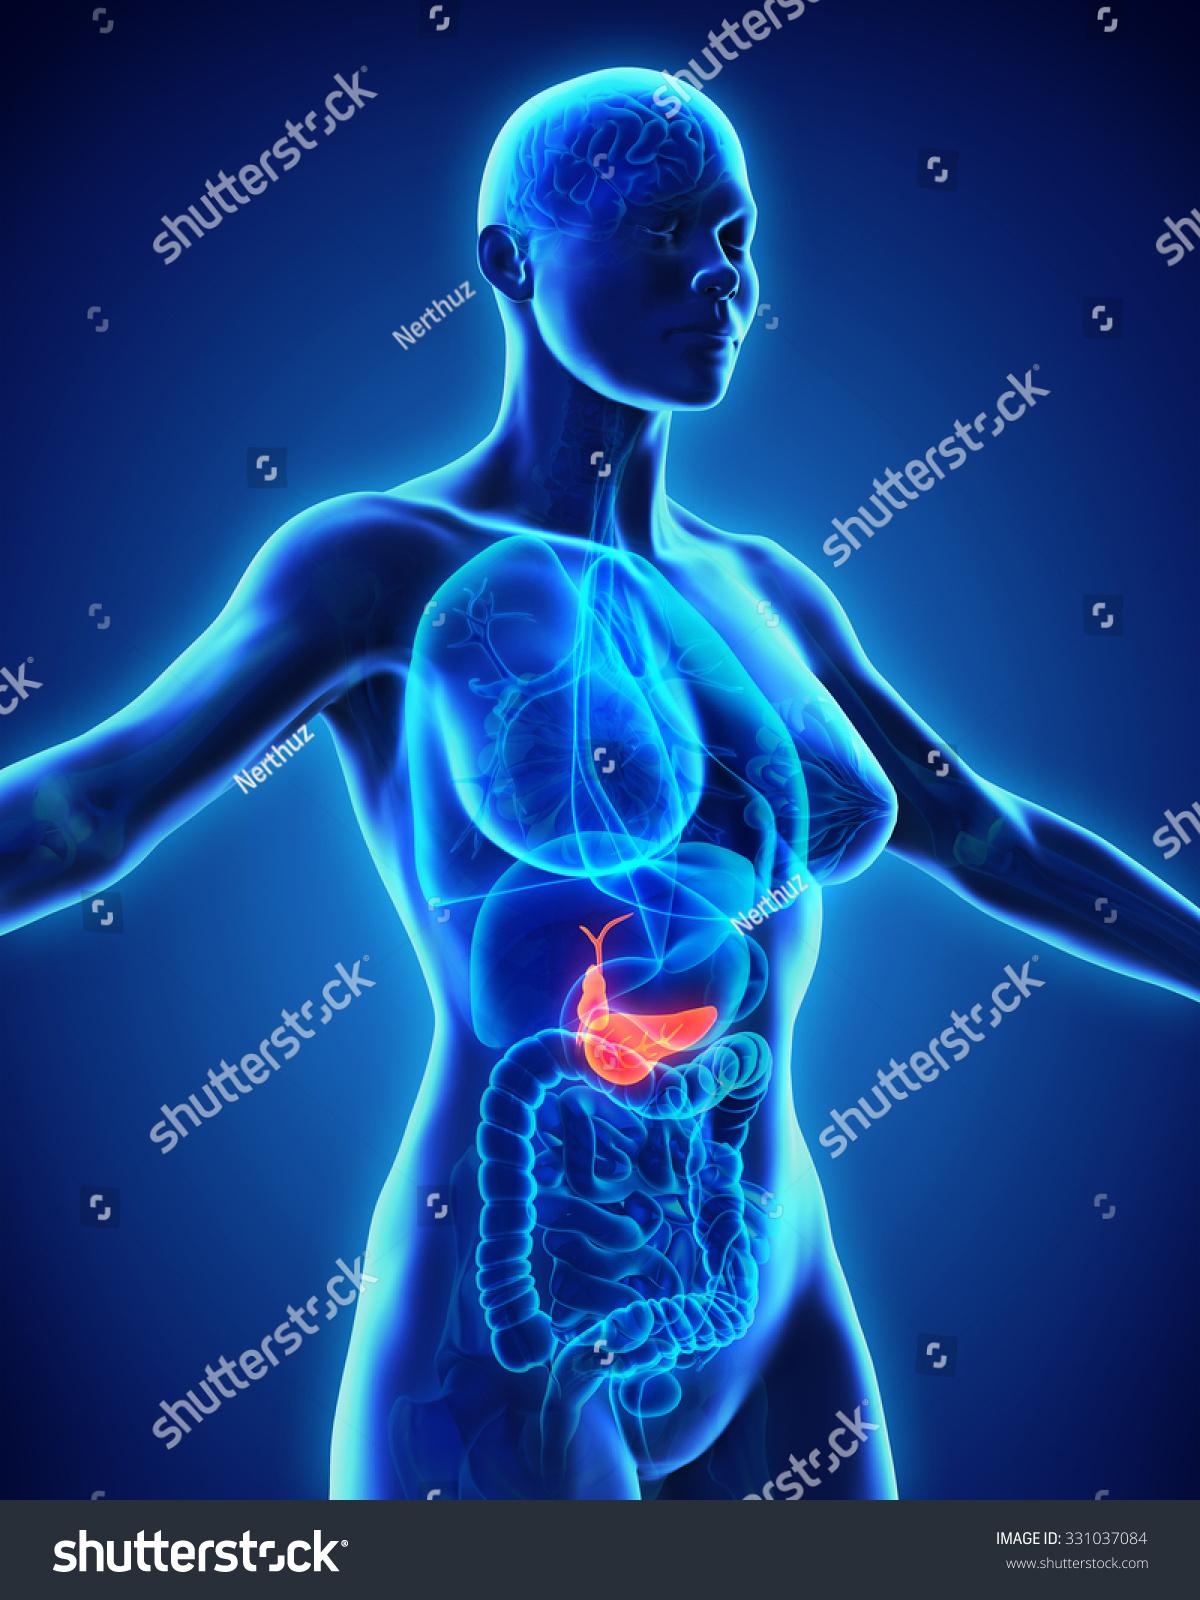 Human Gallbladder And Pancreas Anatomy Ez Canvas